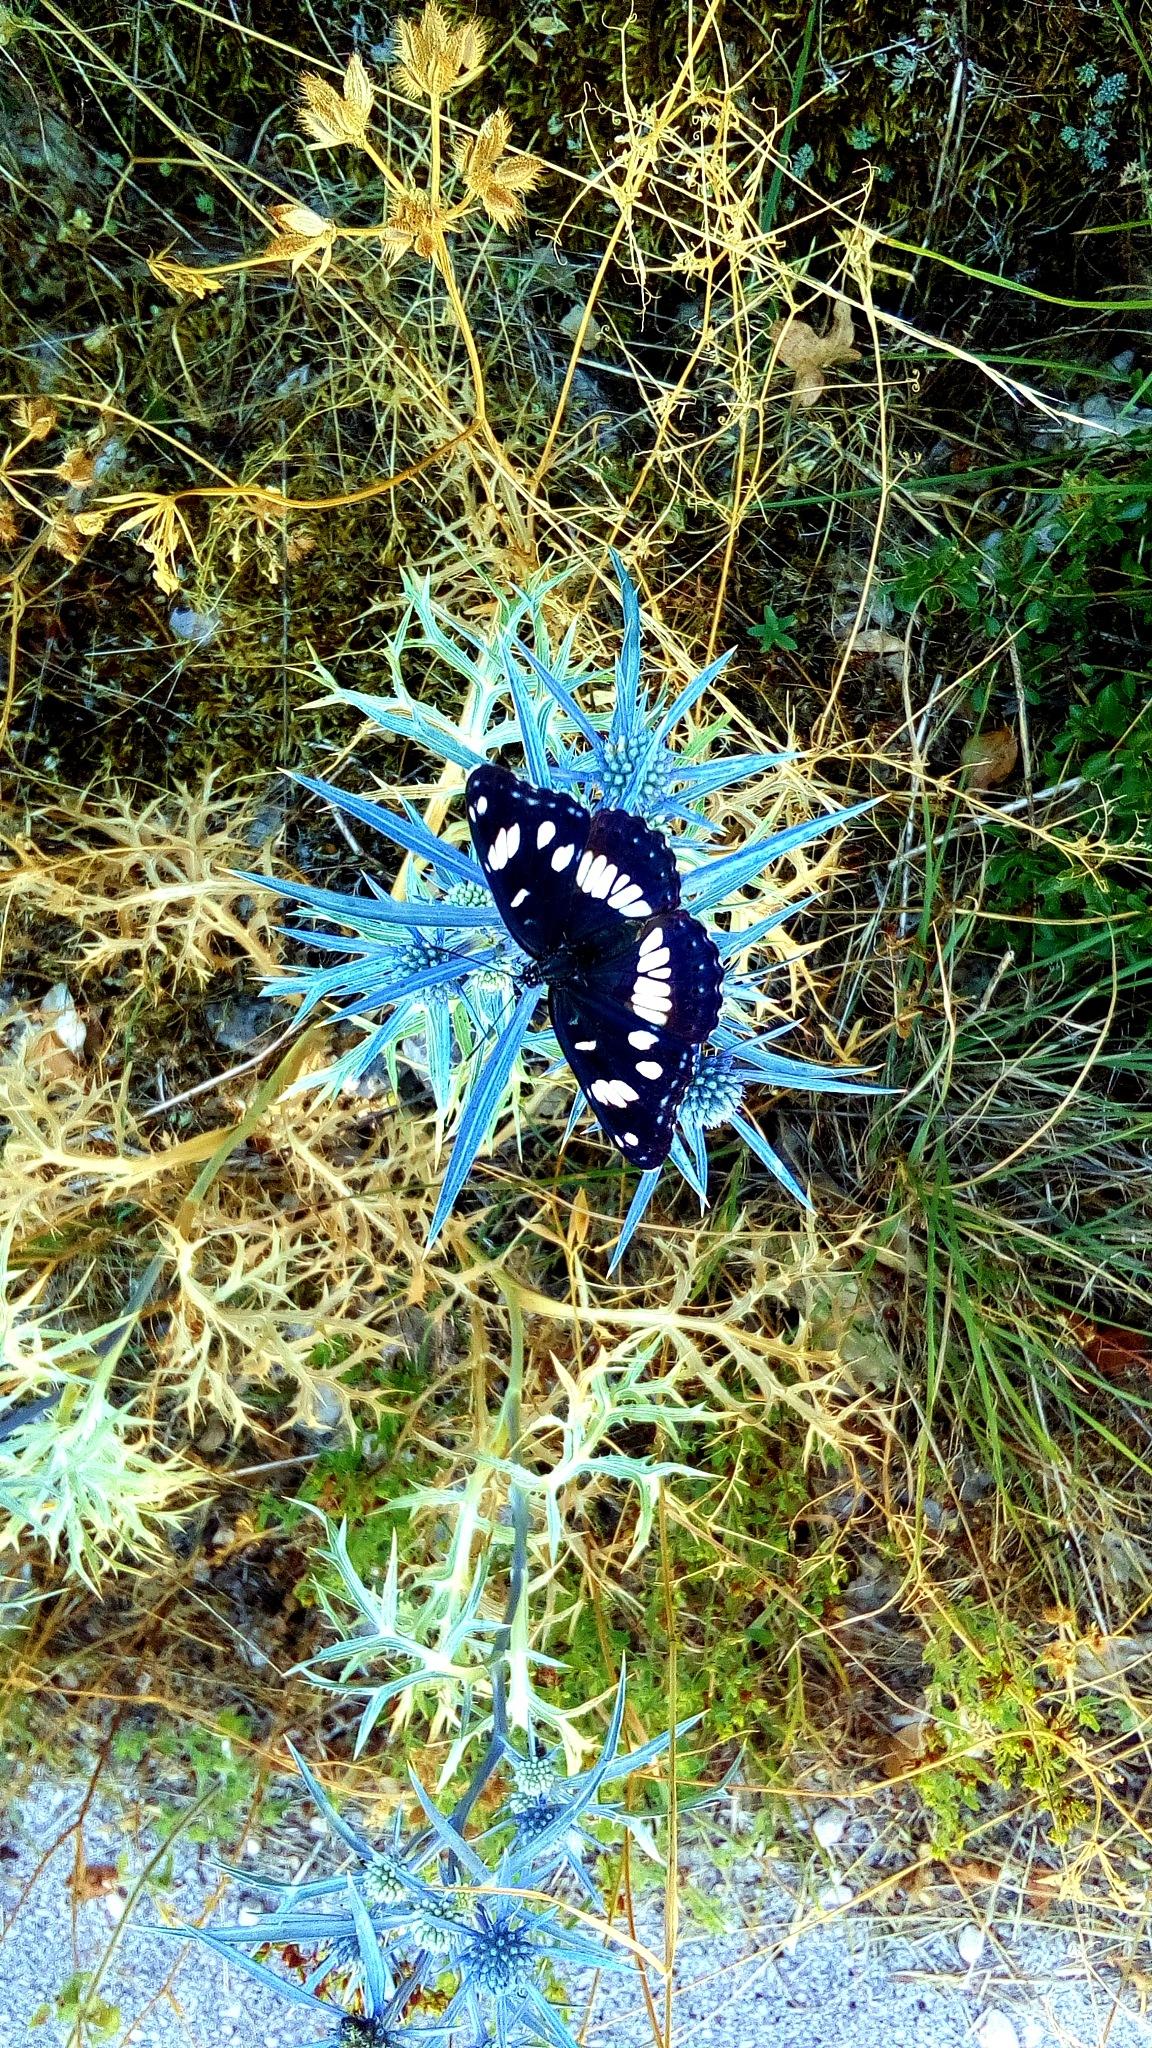 Butterfly by glogloriabanic